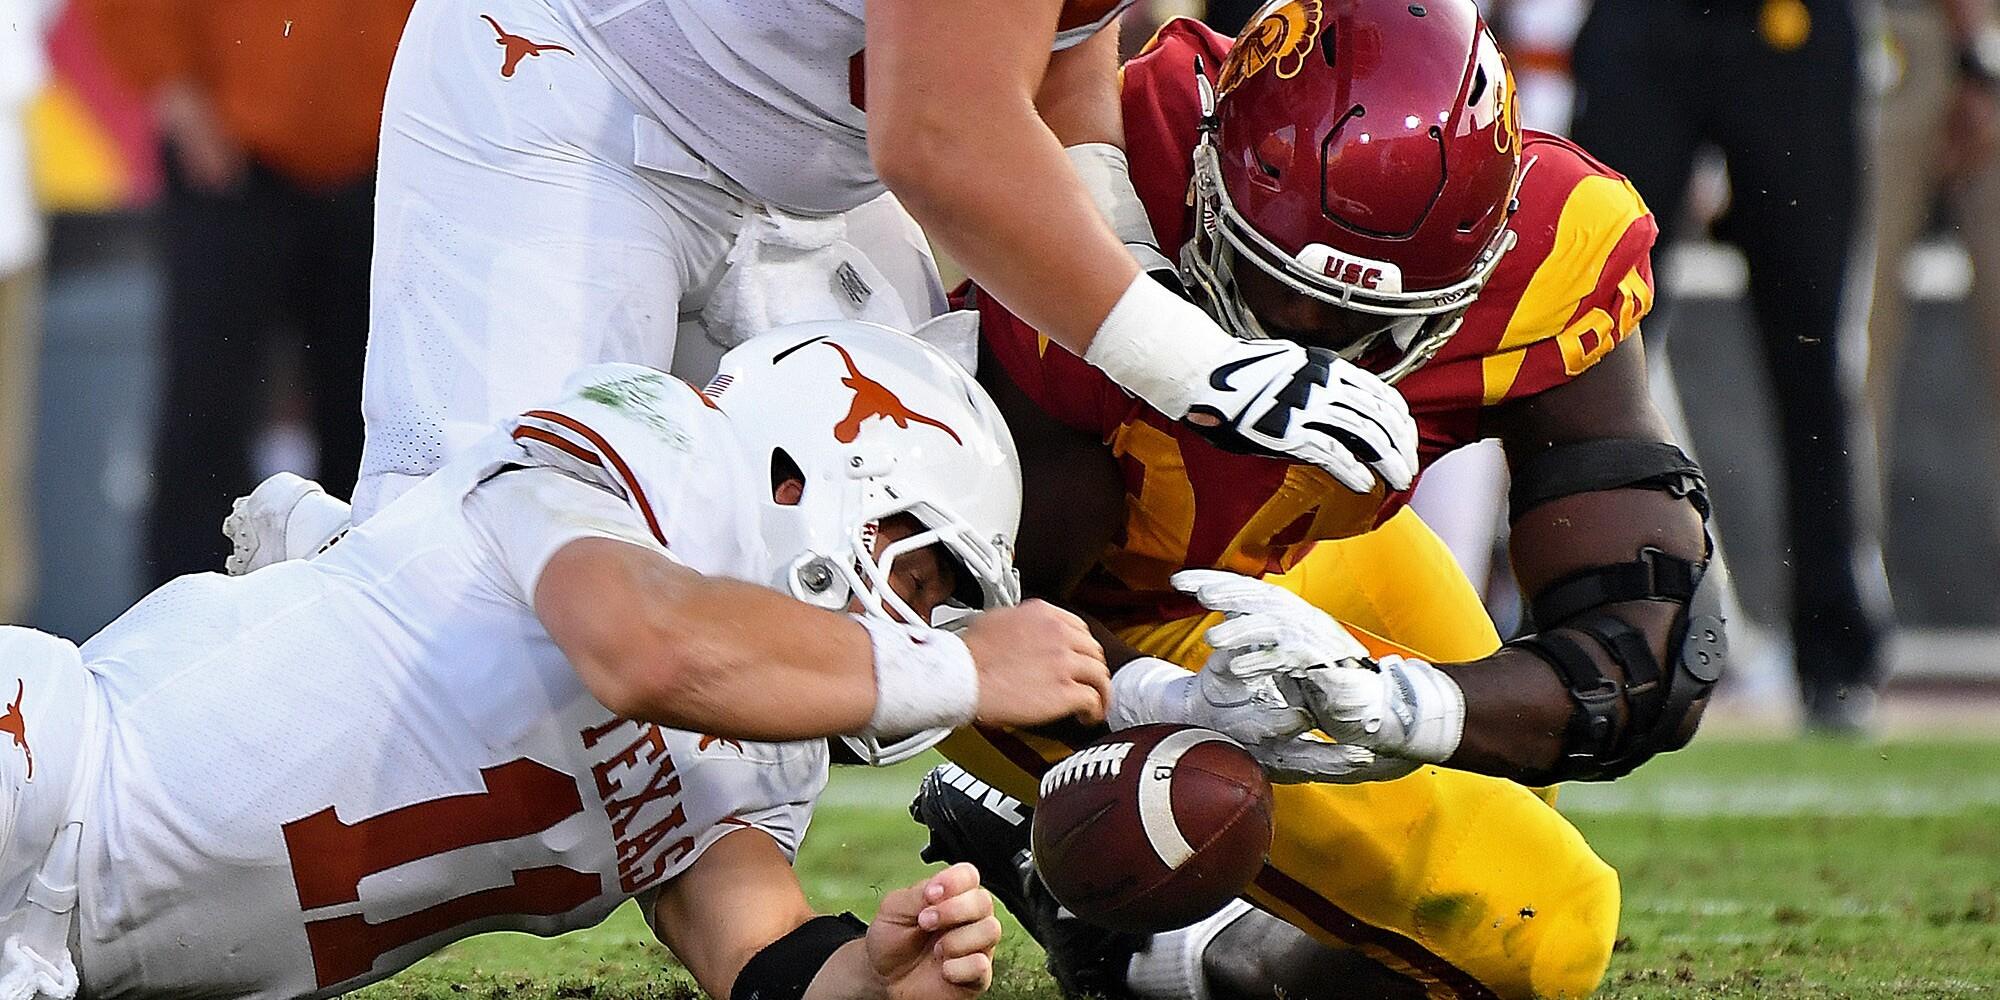 USC vs. Texas: Longhorns defeat the Trojans 37-14